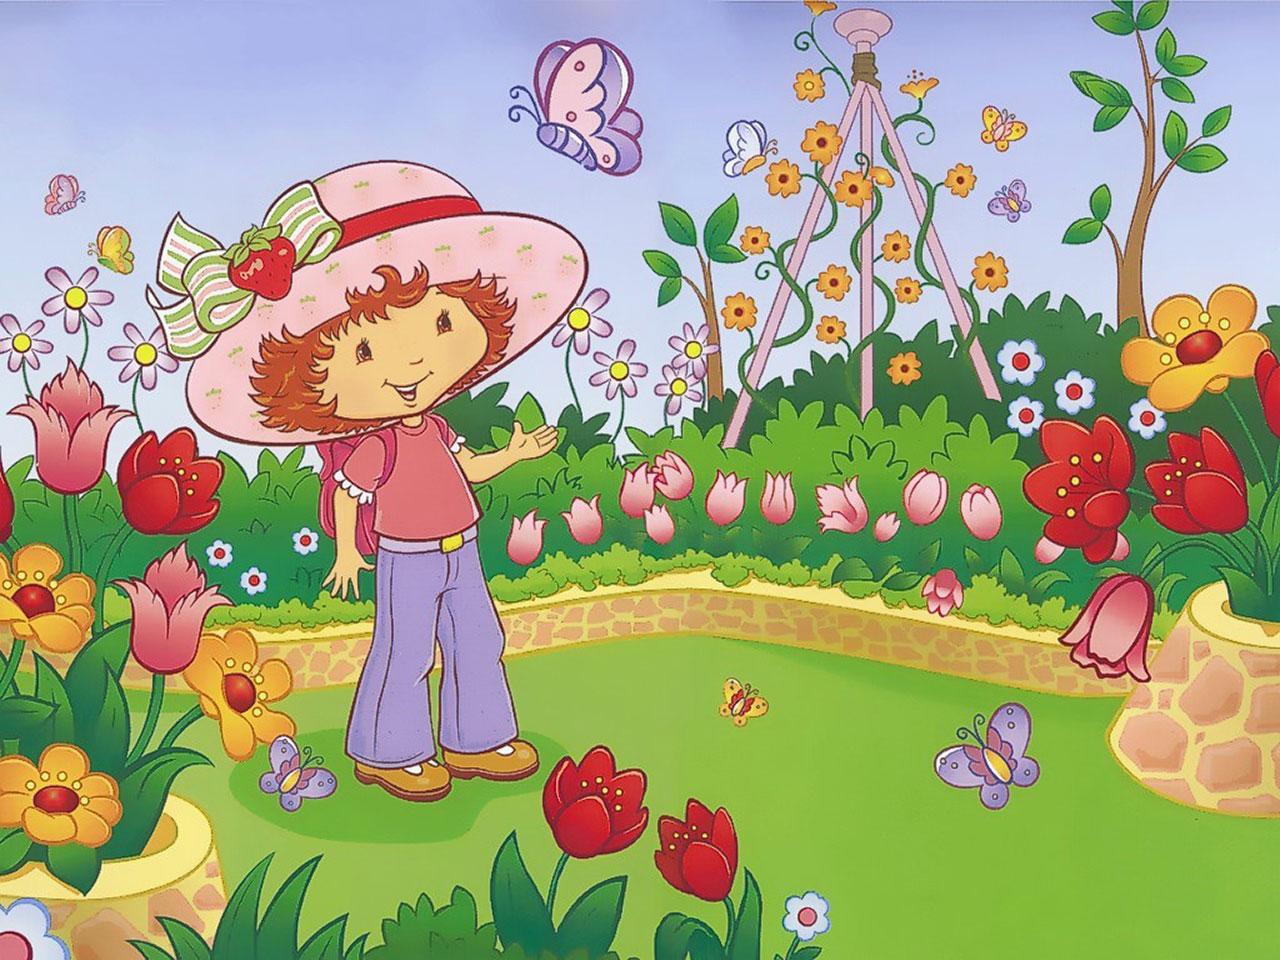 strawberry shortcake Computer Wallpapers Desktop Backgrounds 1280x960